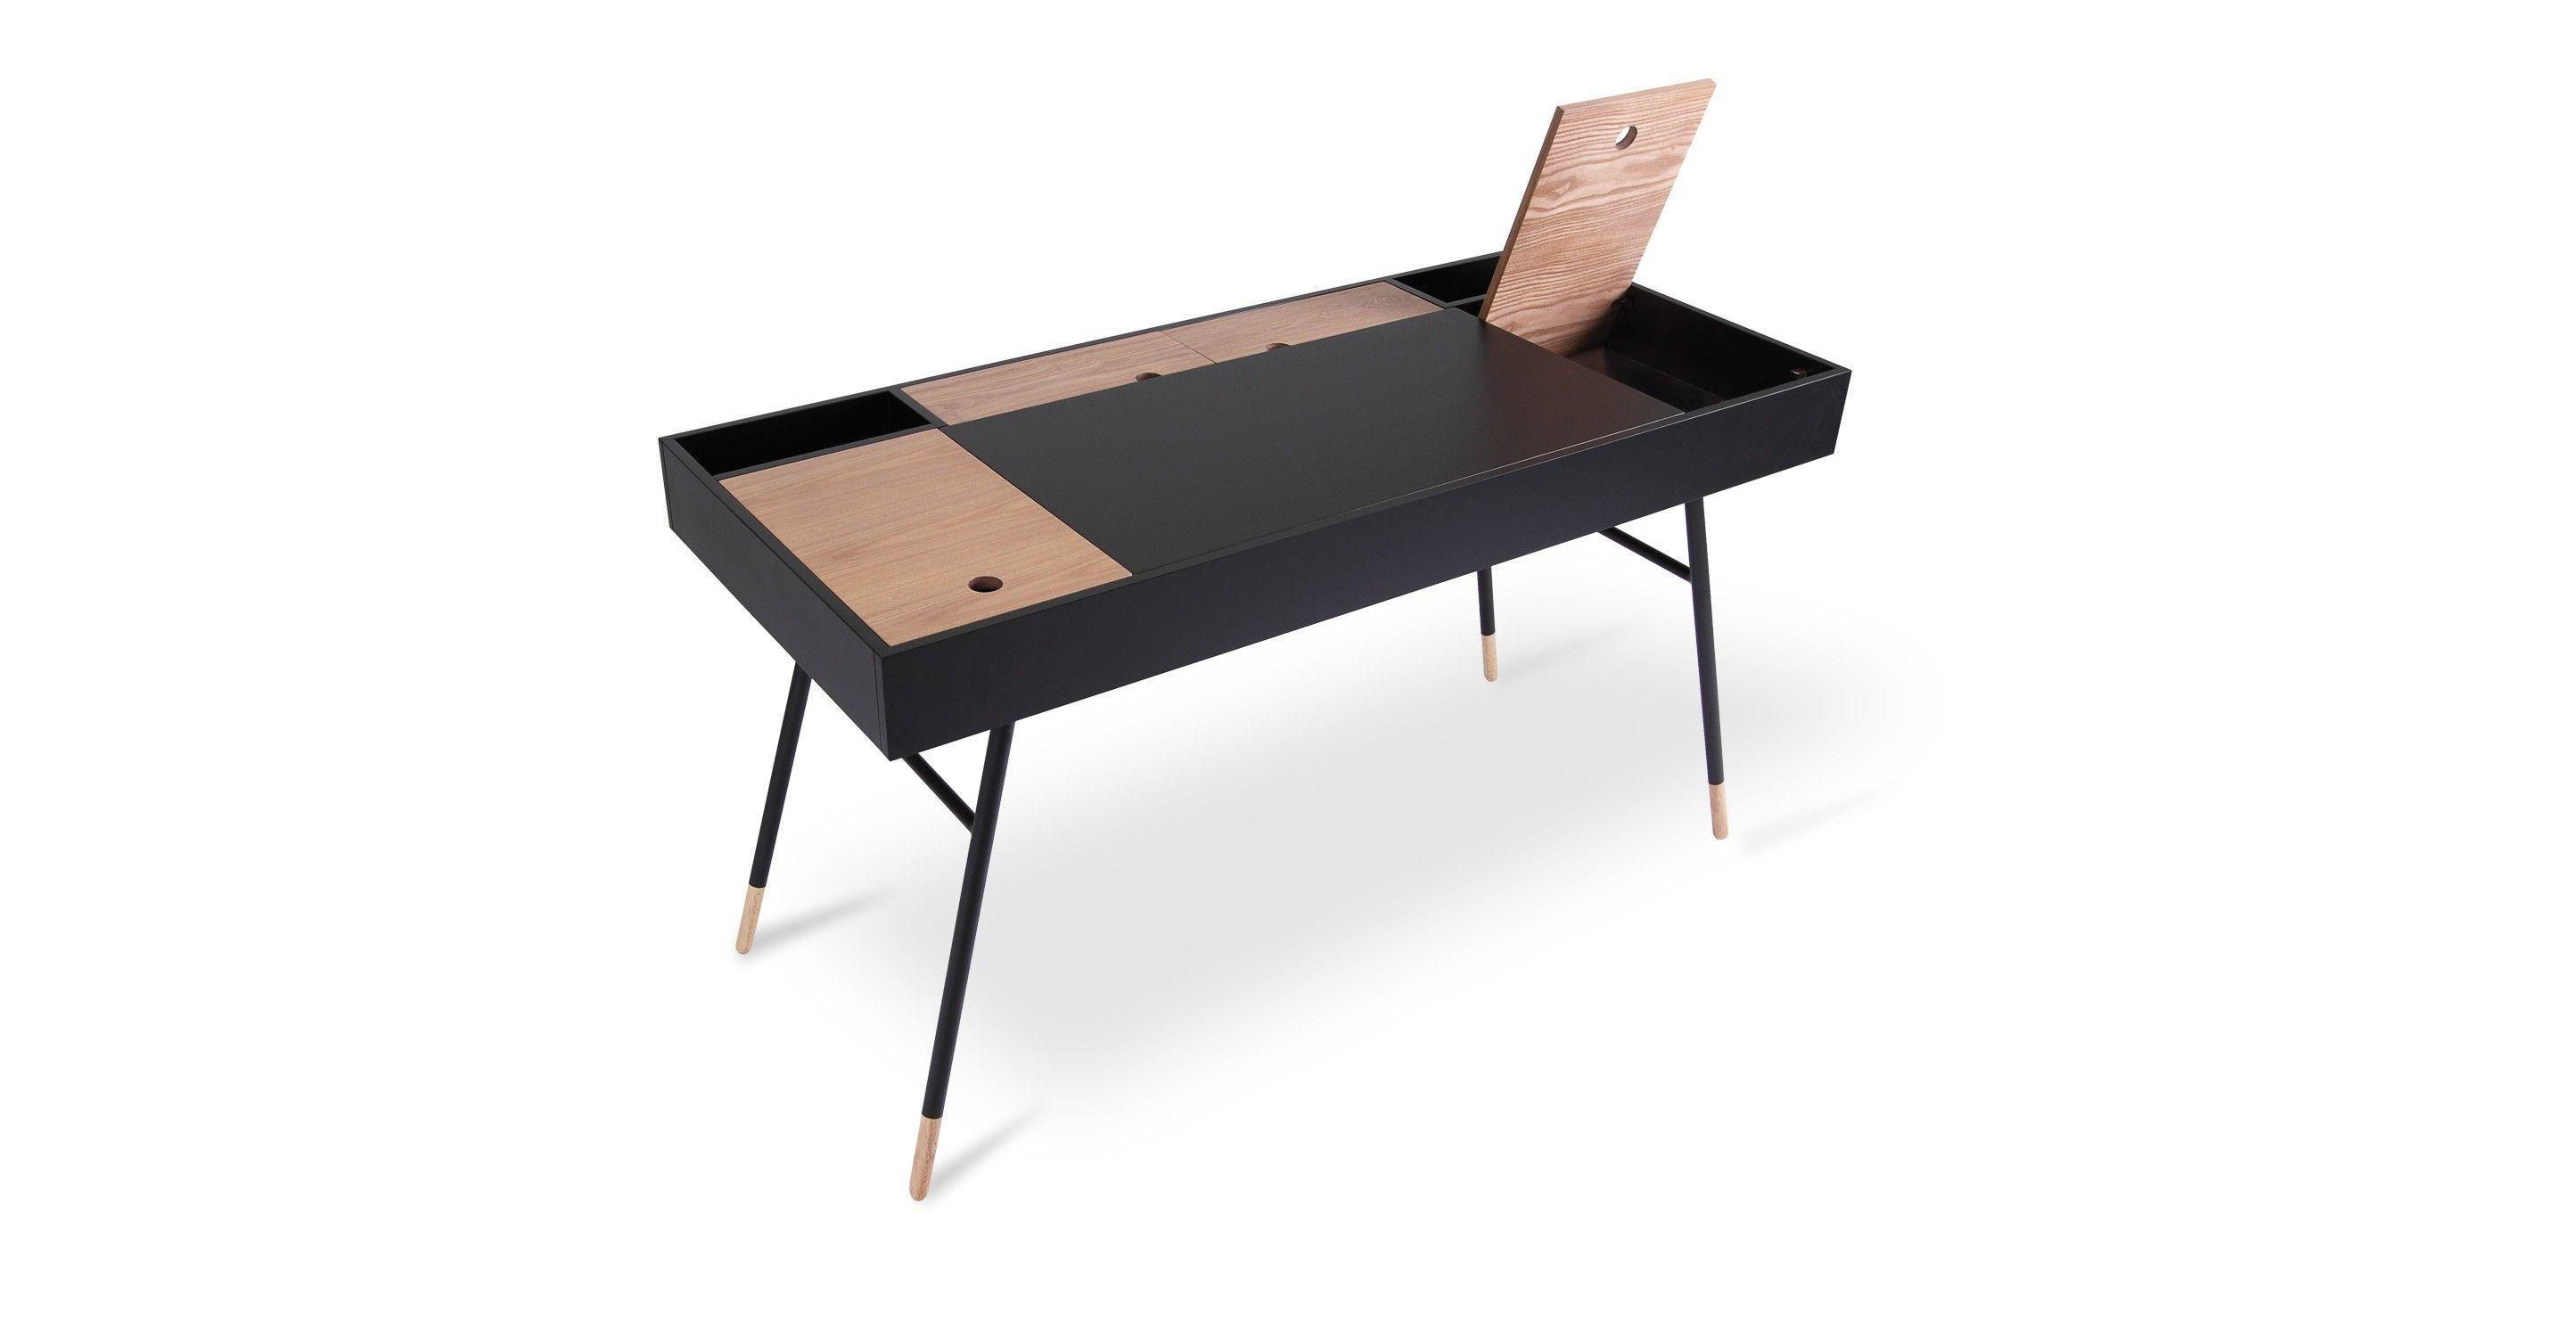 Beau Morse Black Desk   Tables   Bryght | Modern, Mid Century And Scandinavian  Furniture